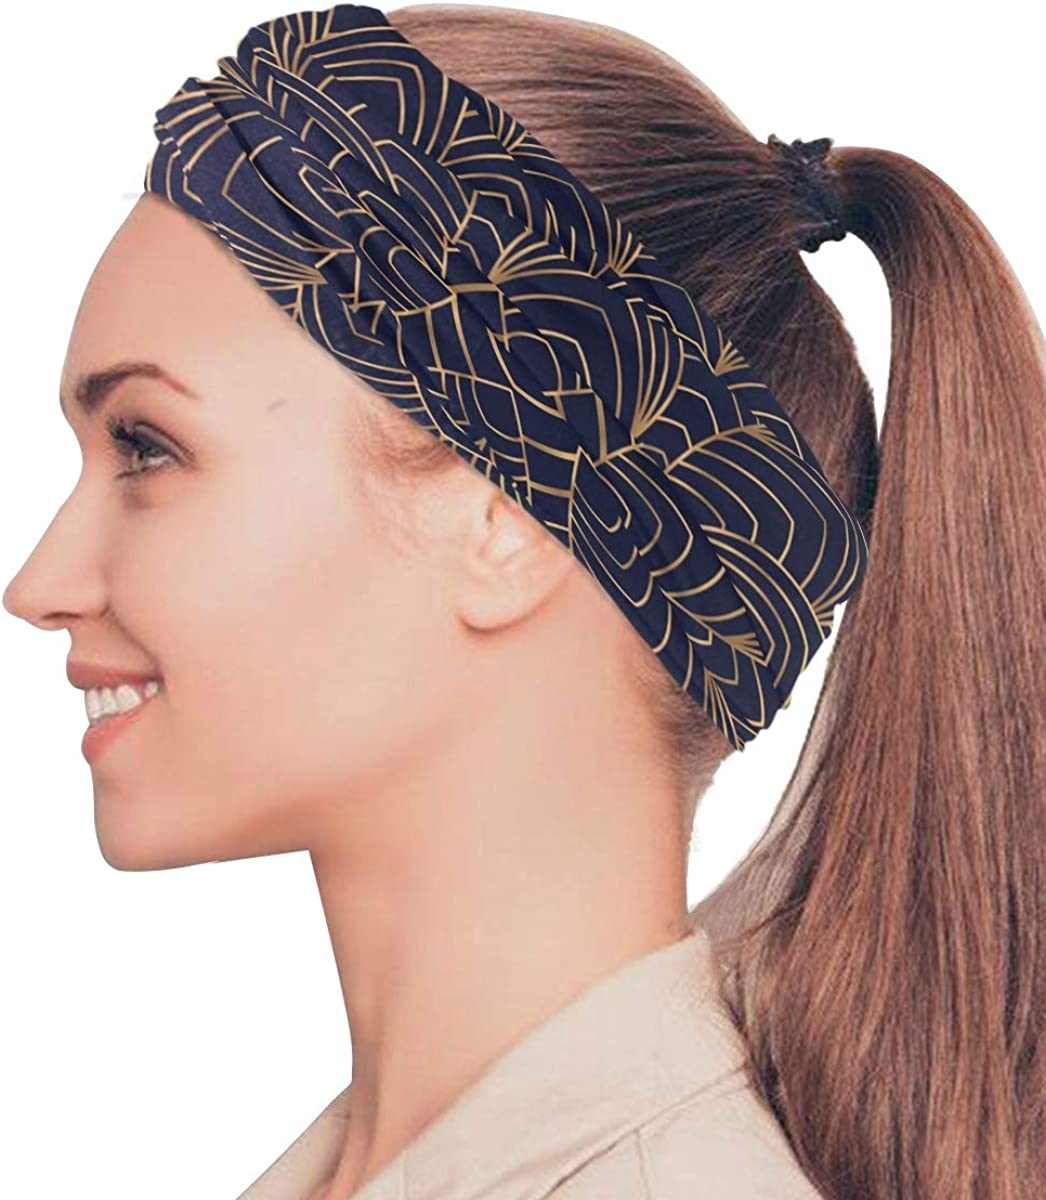 Face Mask Bandana for Women Men, Golden Floral Pattern Neck Gaiter Balaclava Face Cover Sun Dust Mask Magic Scarf Headwear